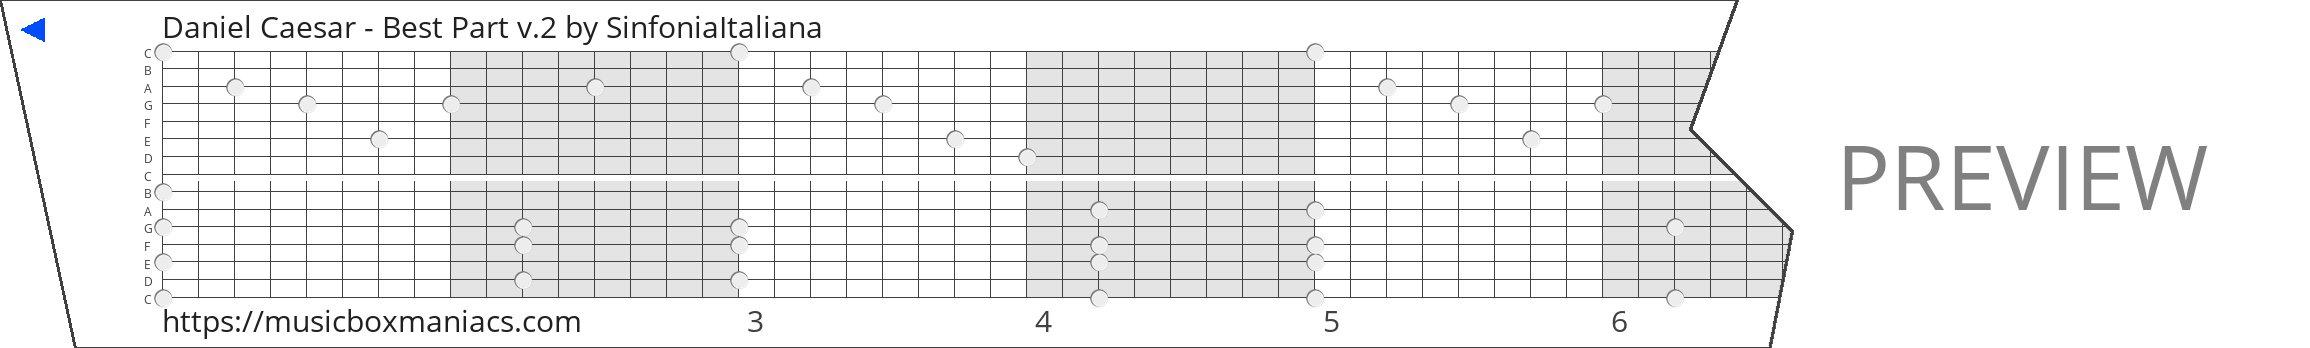 Daniel Caesar - Best Part v.2 15 note music box paper strip